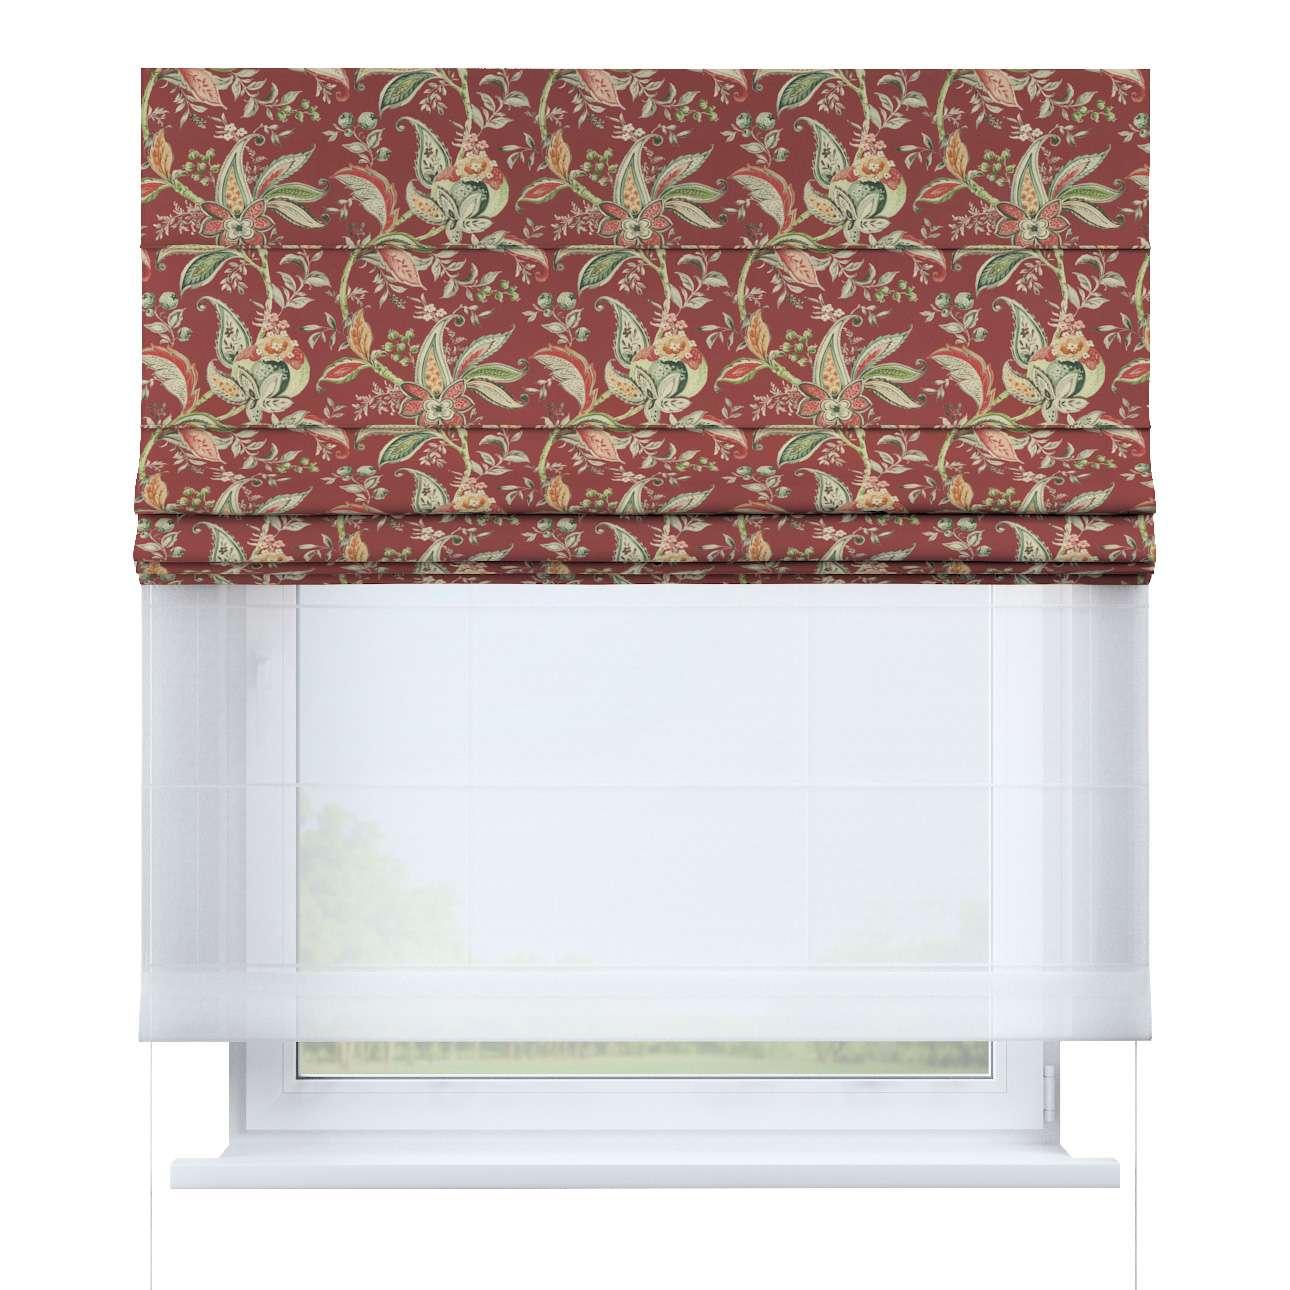 DUO Rímska roleta V kolekcii Gardenia, tkanina: 142-12